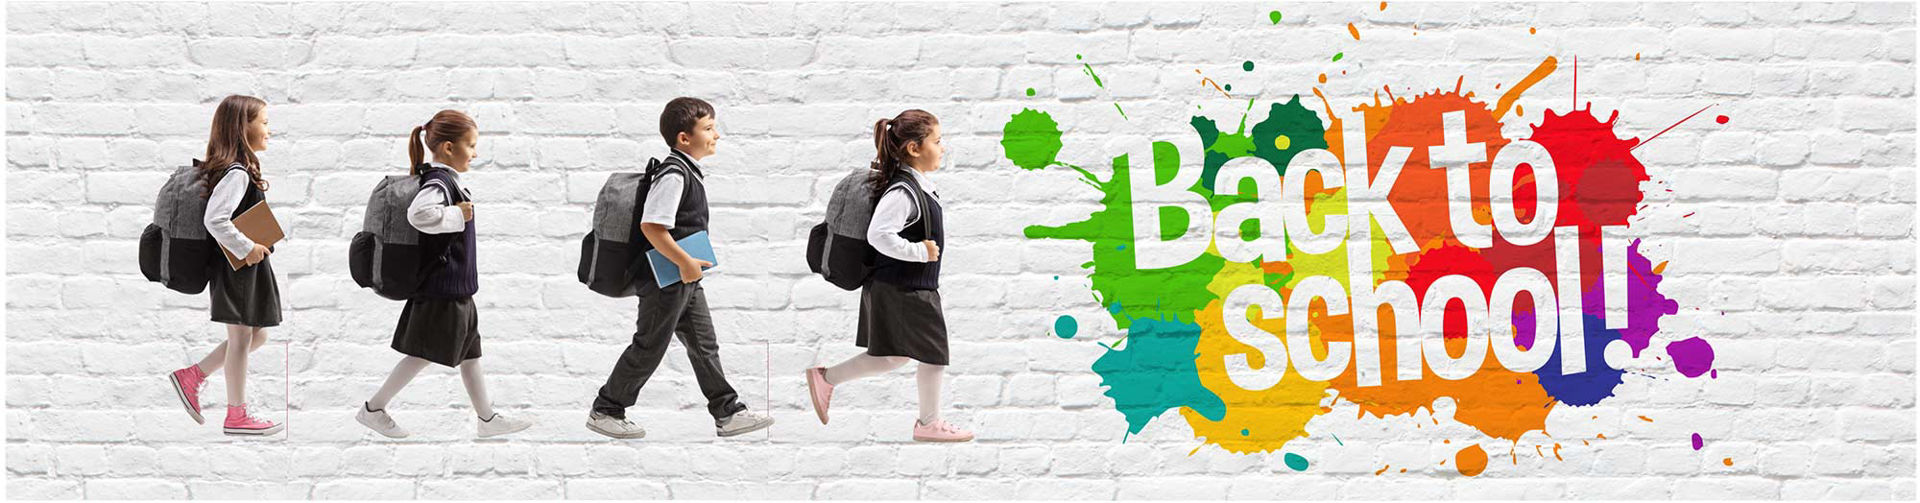 Uniforms for Schools - Back to School Pembrokeshire